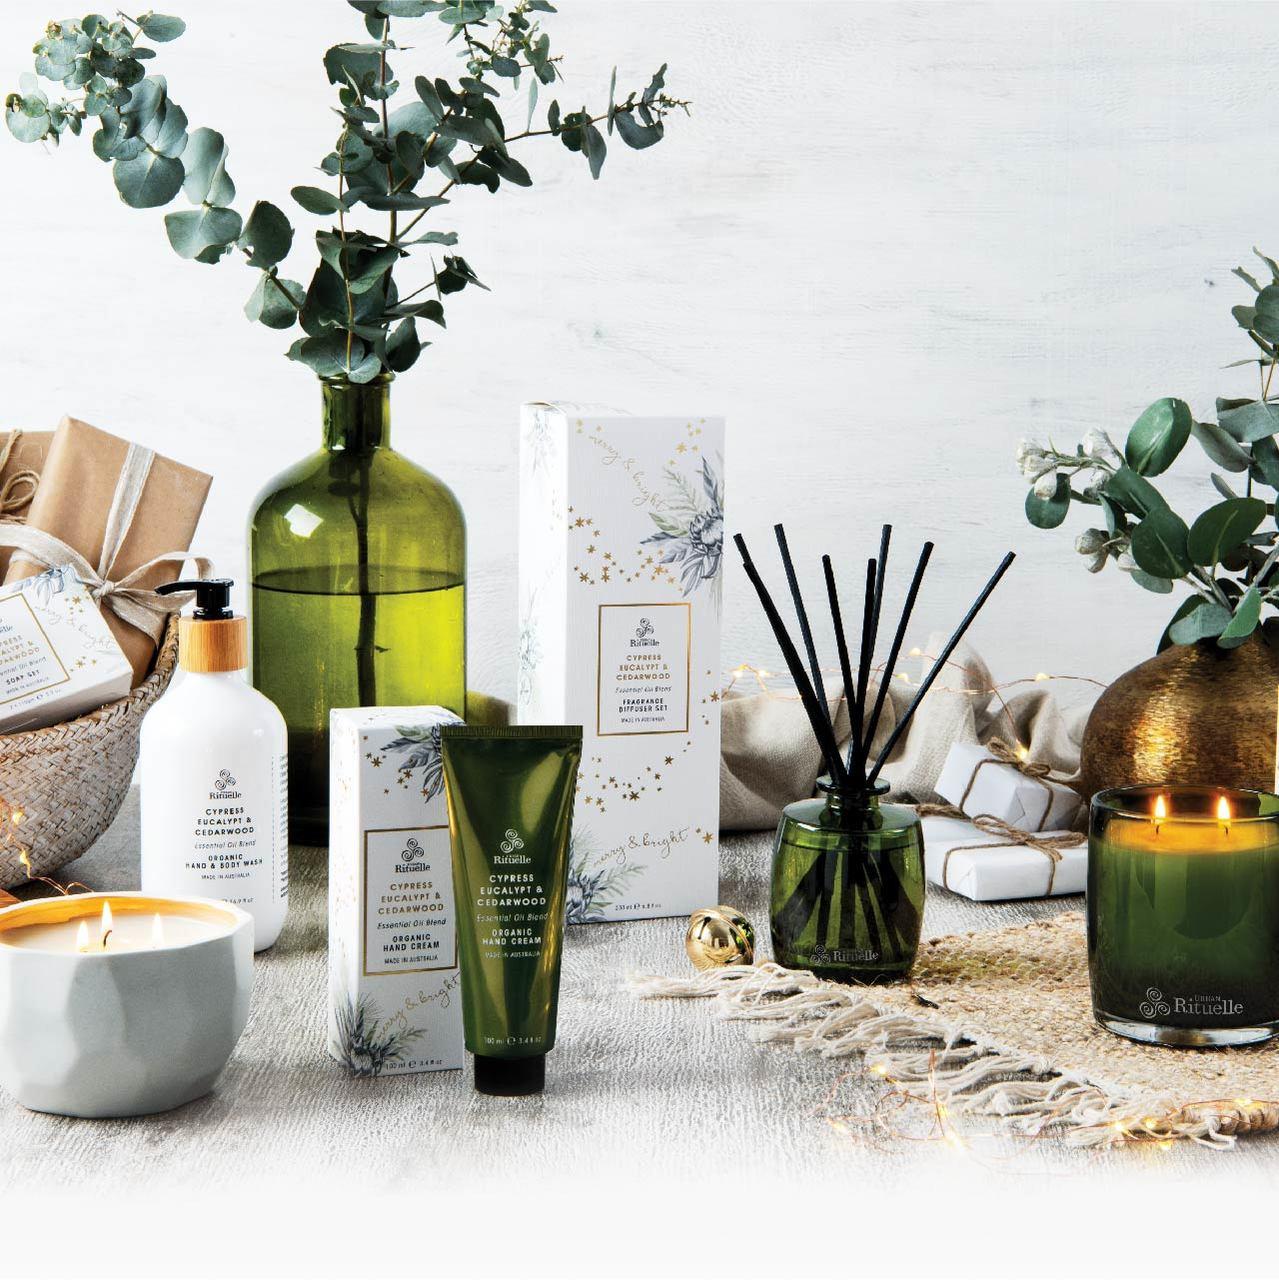 Festive Botanica - Cypress, Eucalypt & Cedarwood - Fragrance Diffuser Set - Urban Rituelle